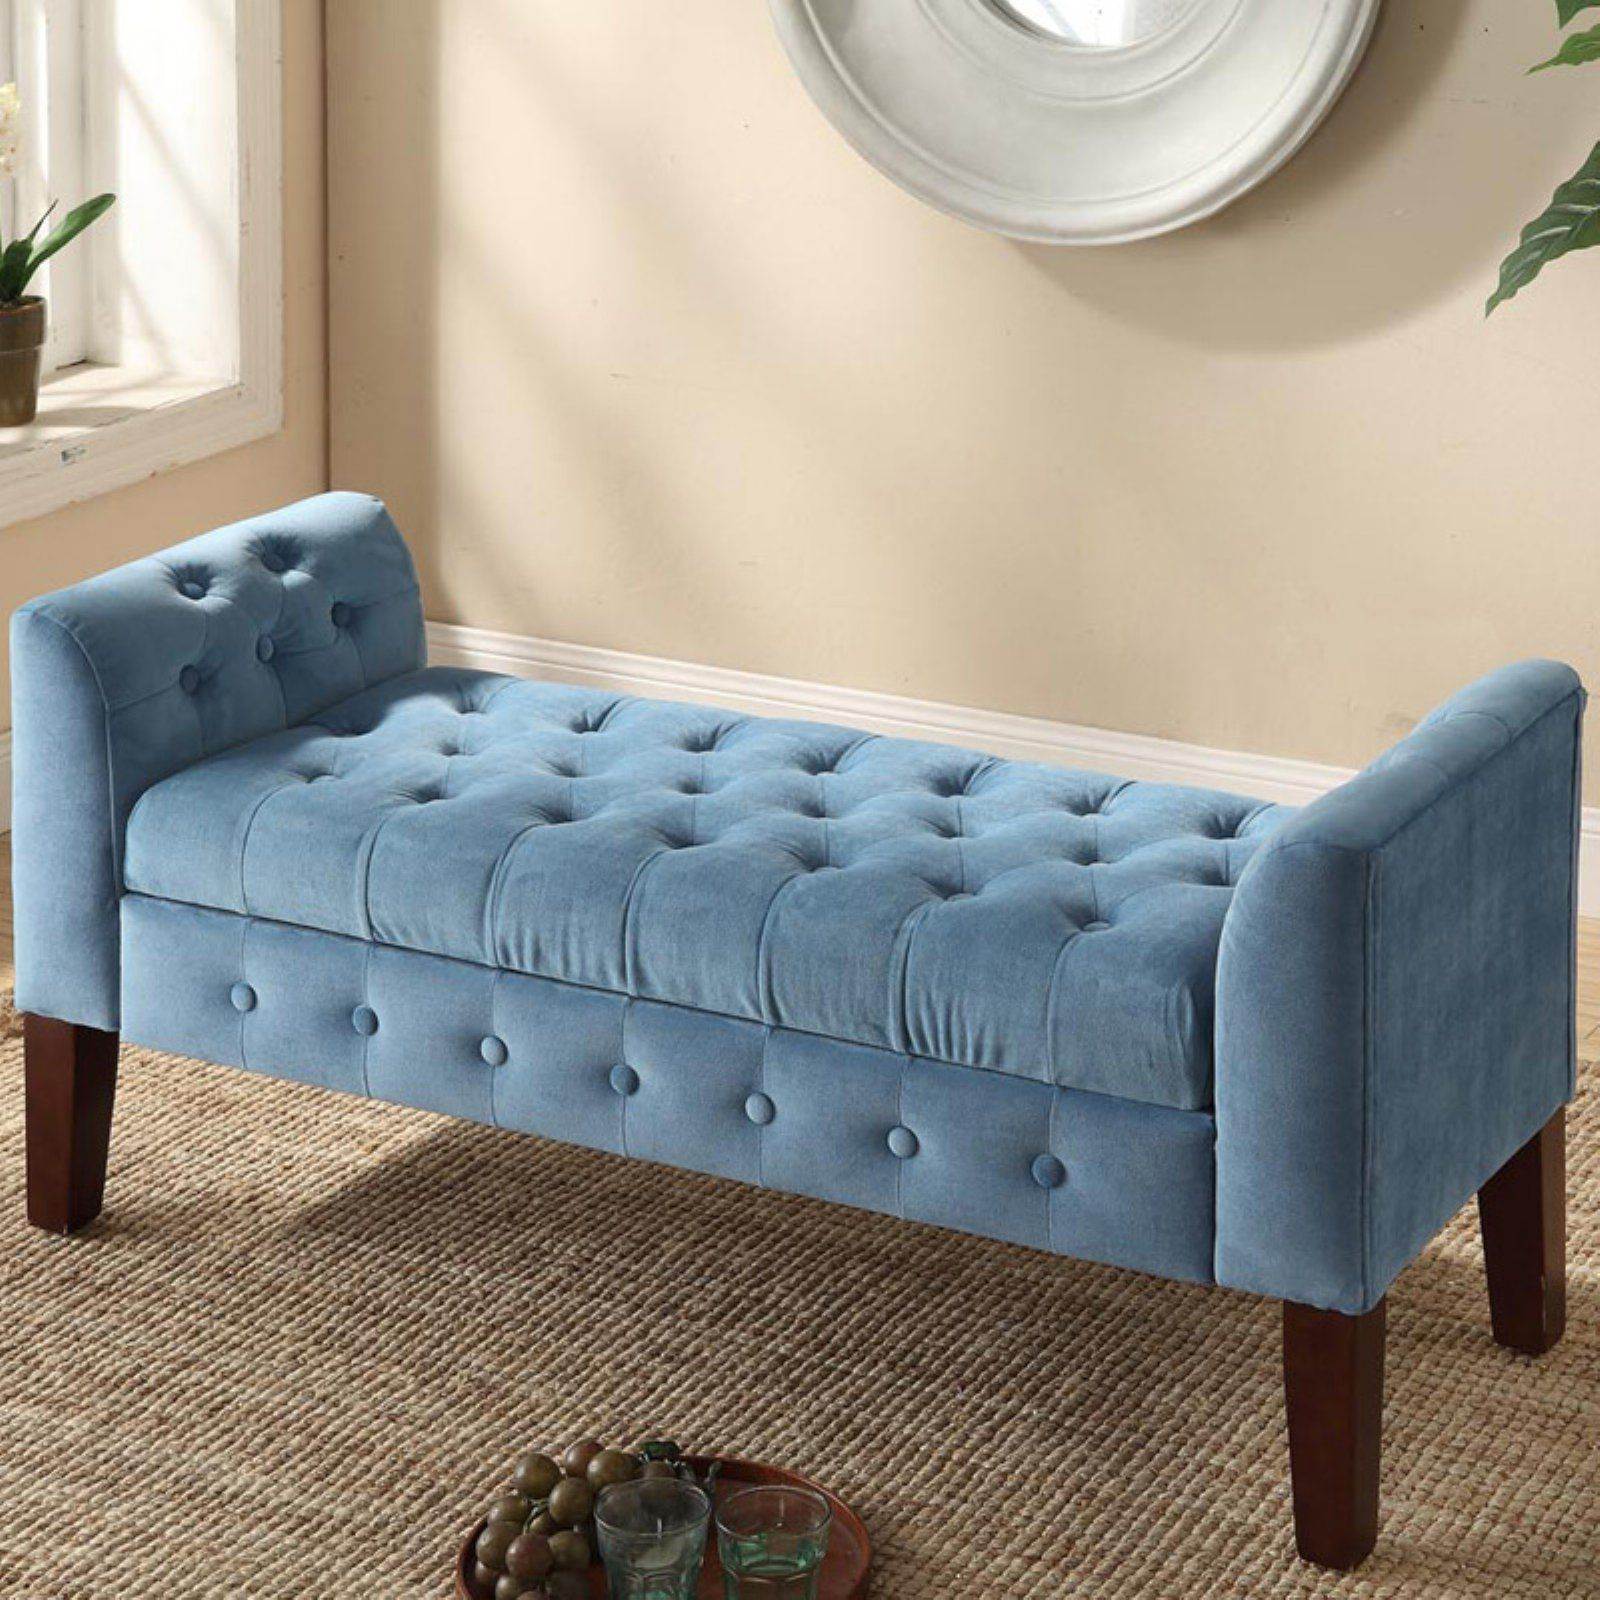 Sensational Kinfine Usa Velvet Tufted Settee Storage Bench Teal Pdpeps Interior Chair Design Pdpepsorg